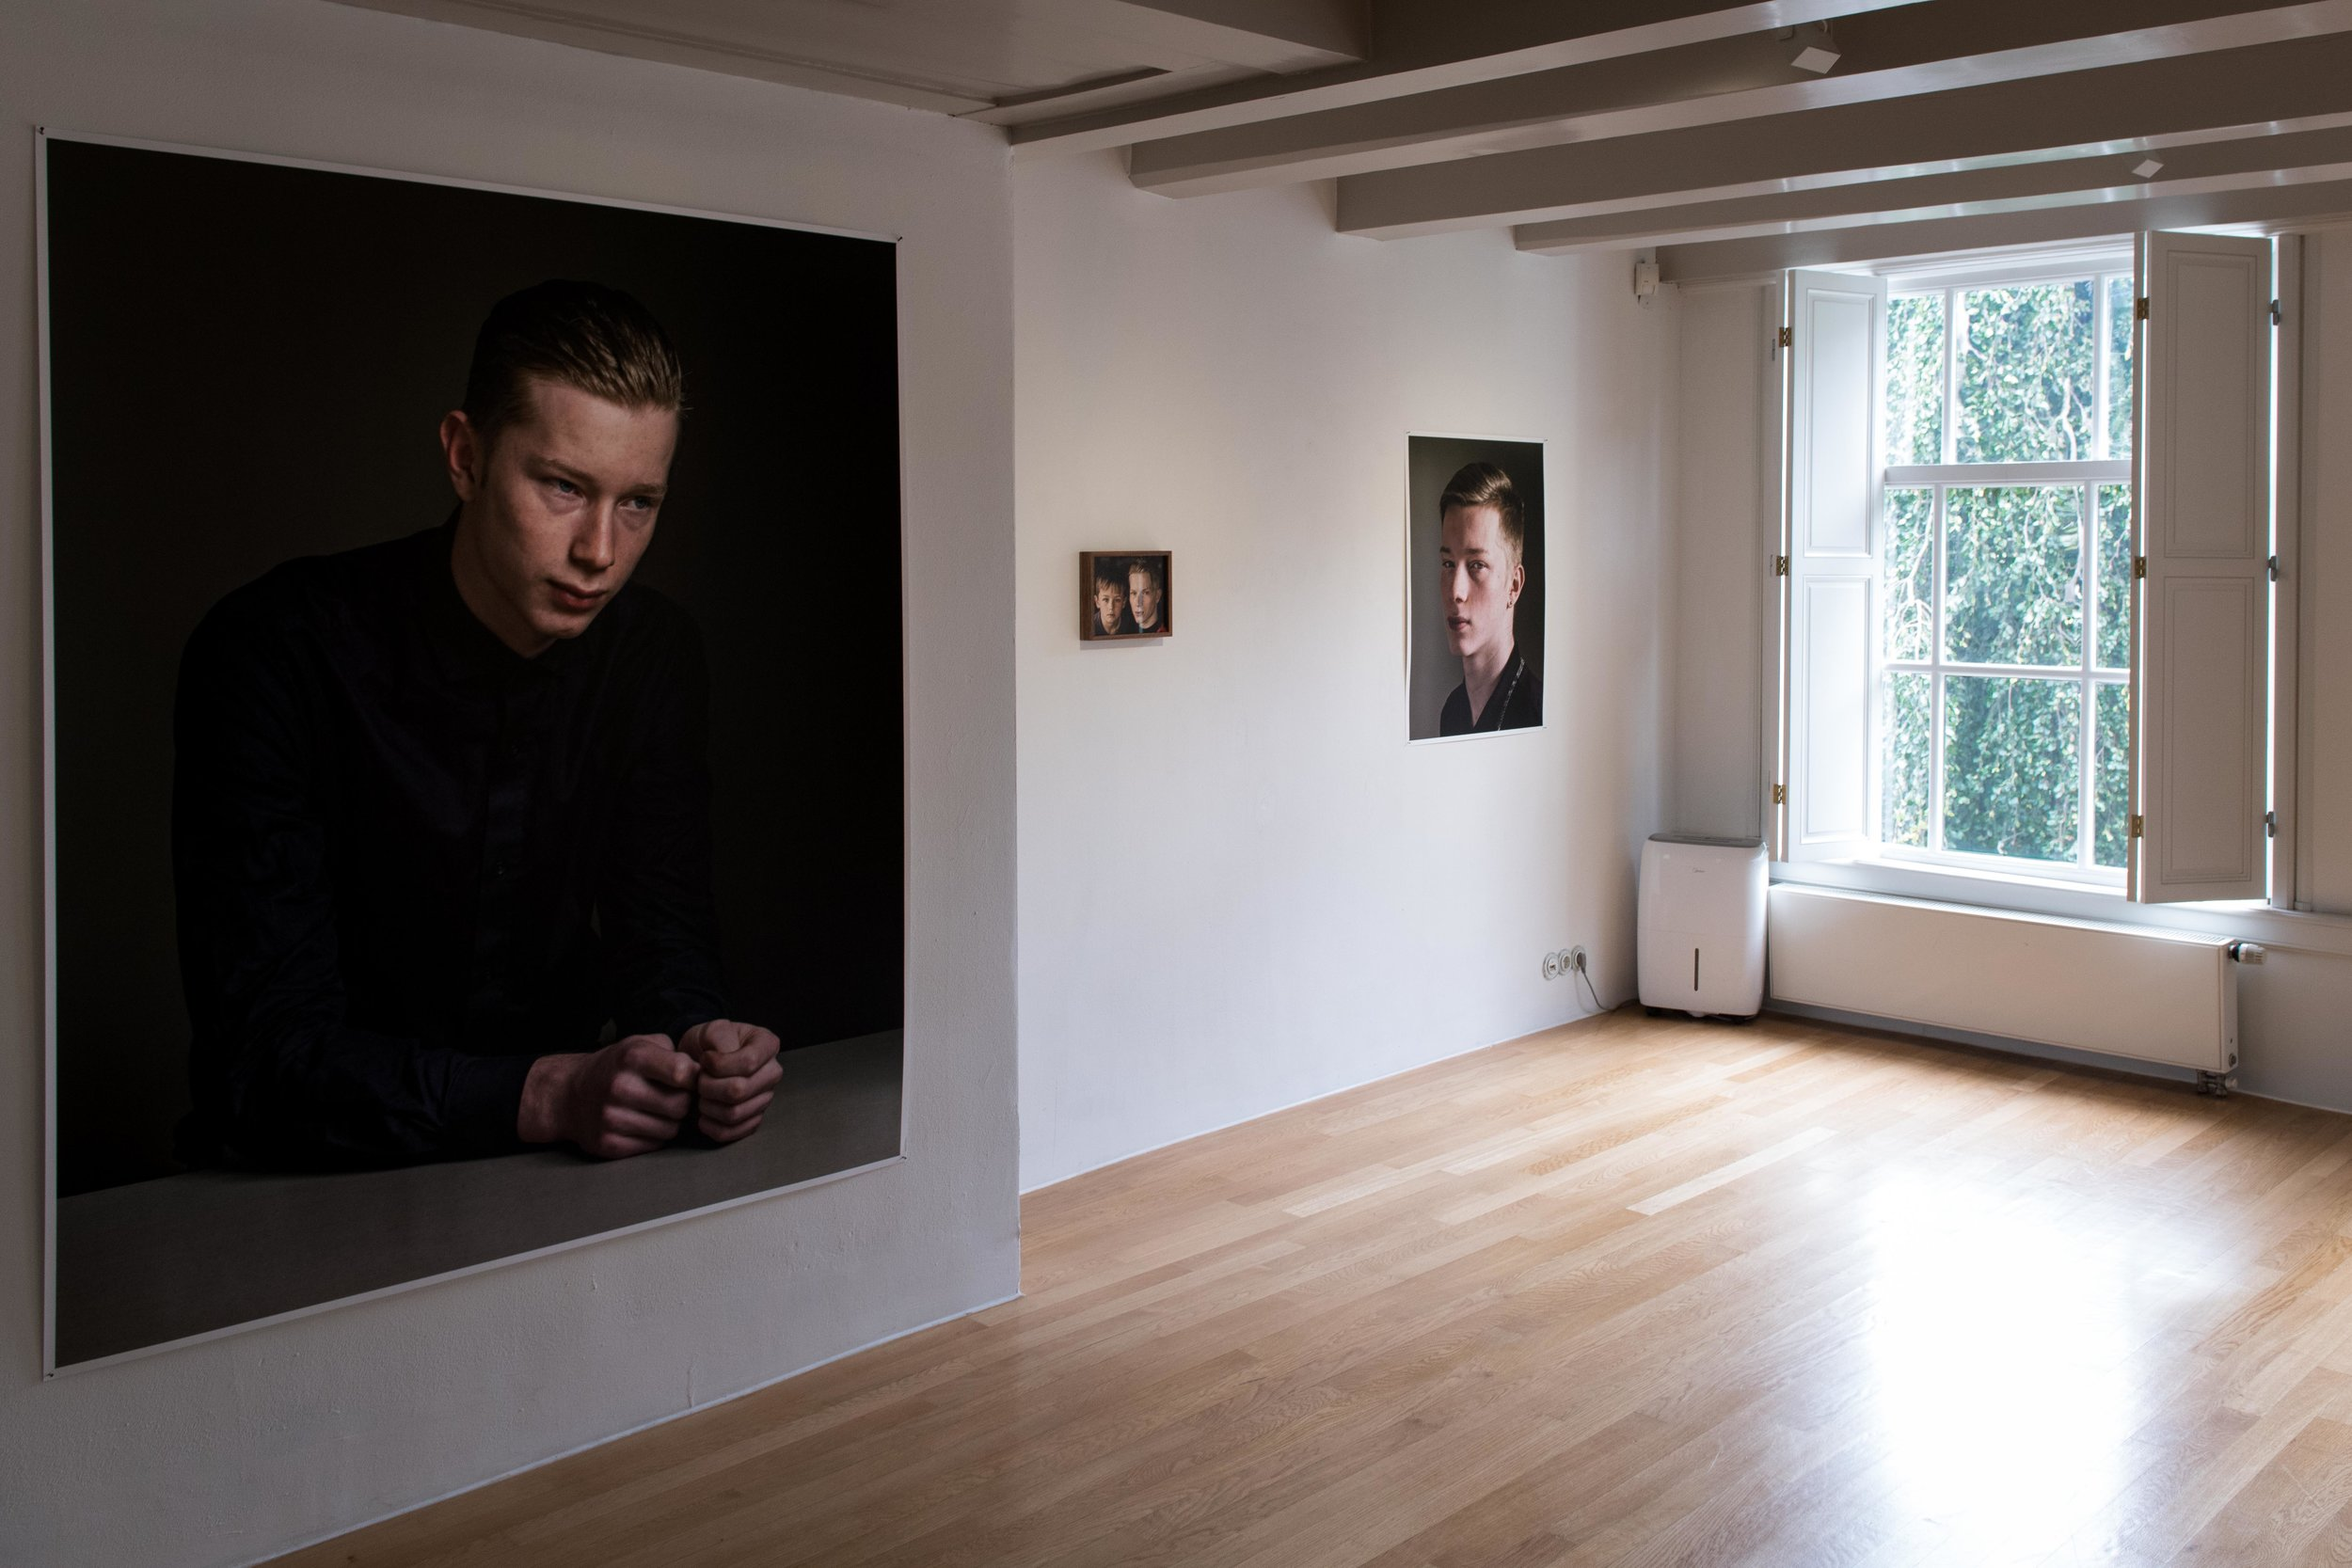 Koos Breukal / Son - A new exhibition at Huis Marseille